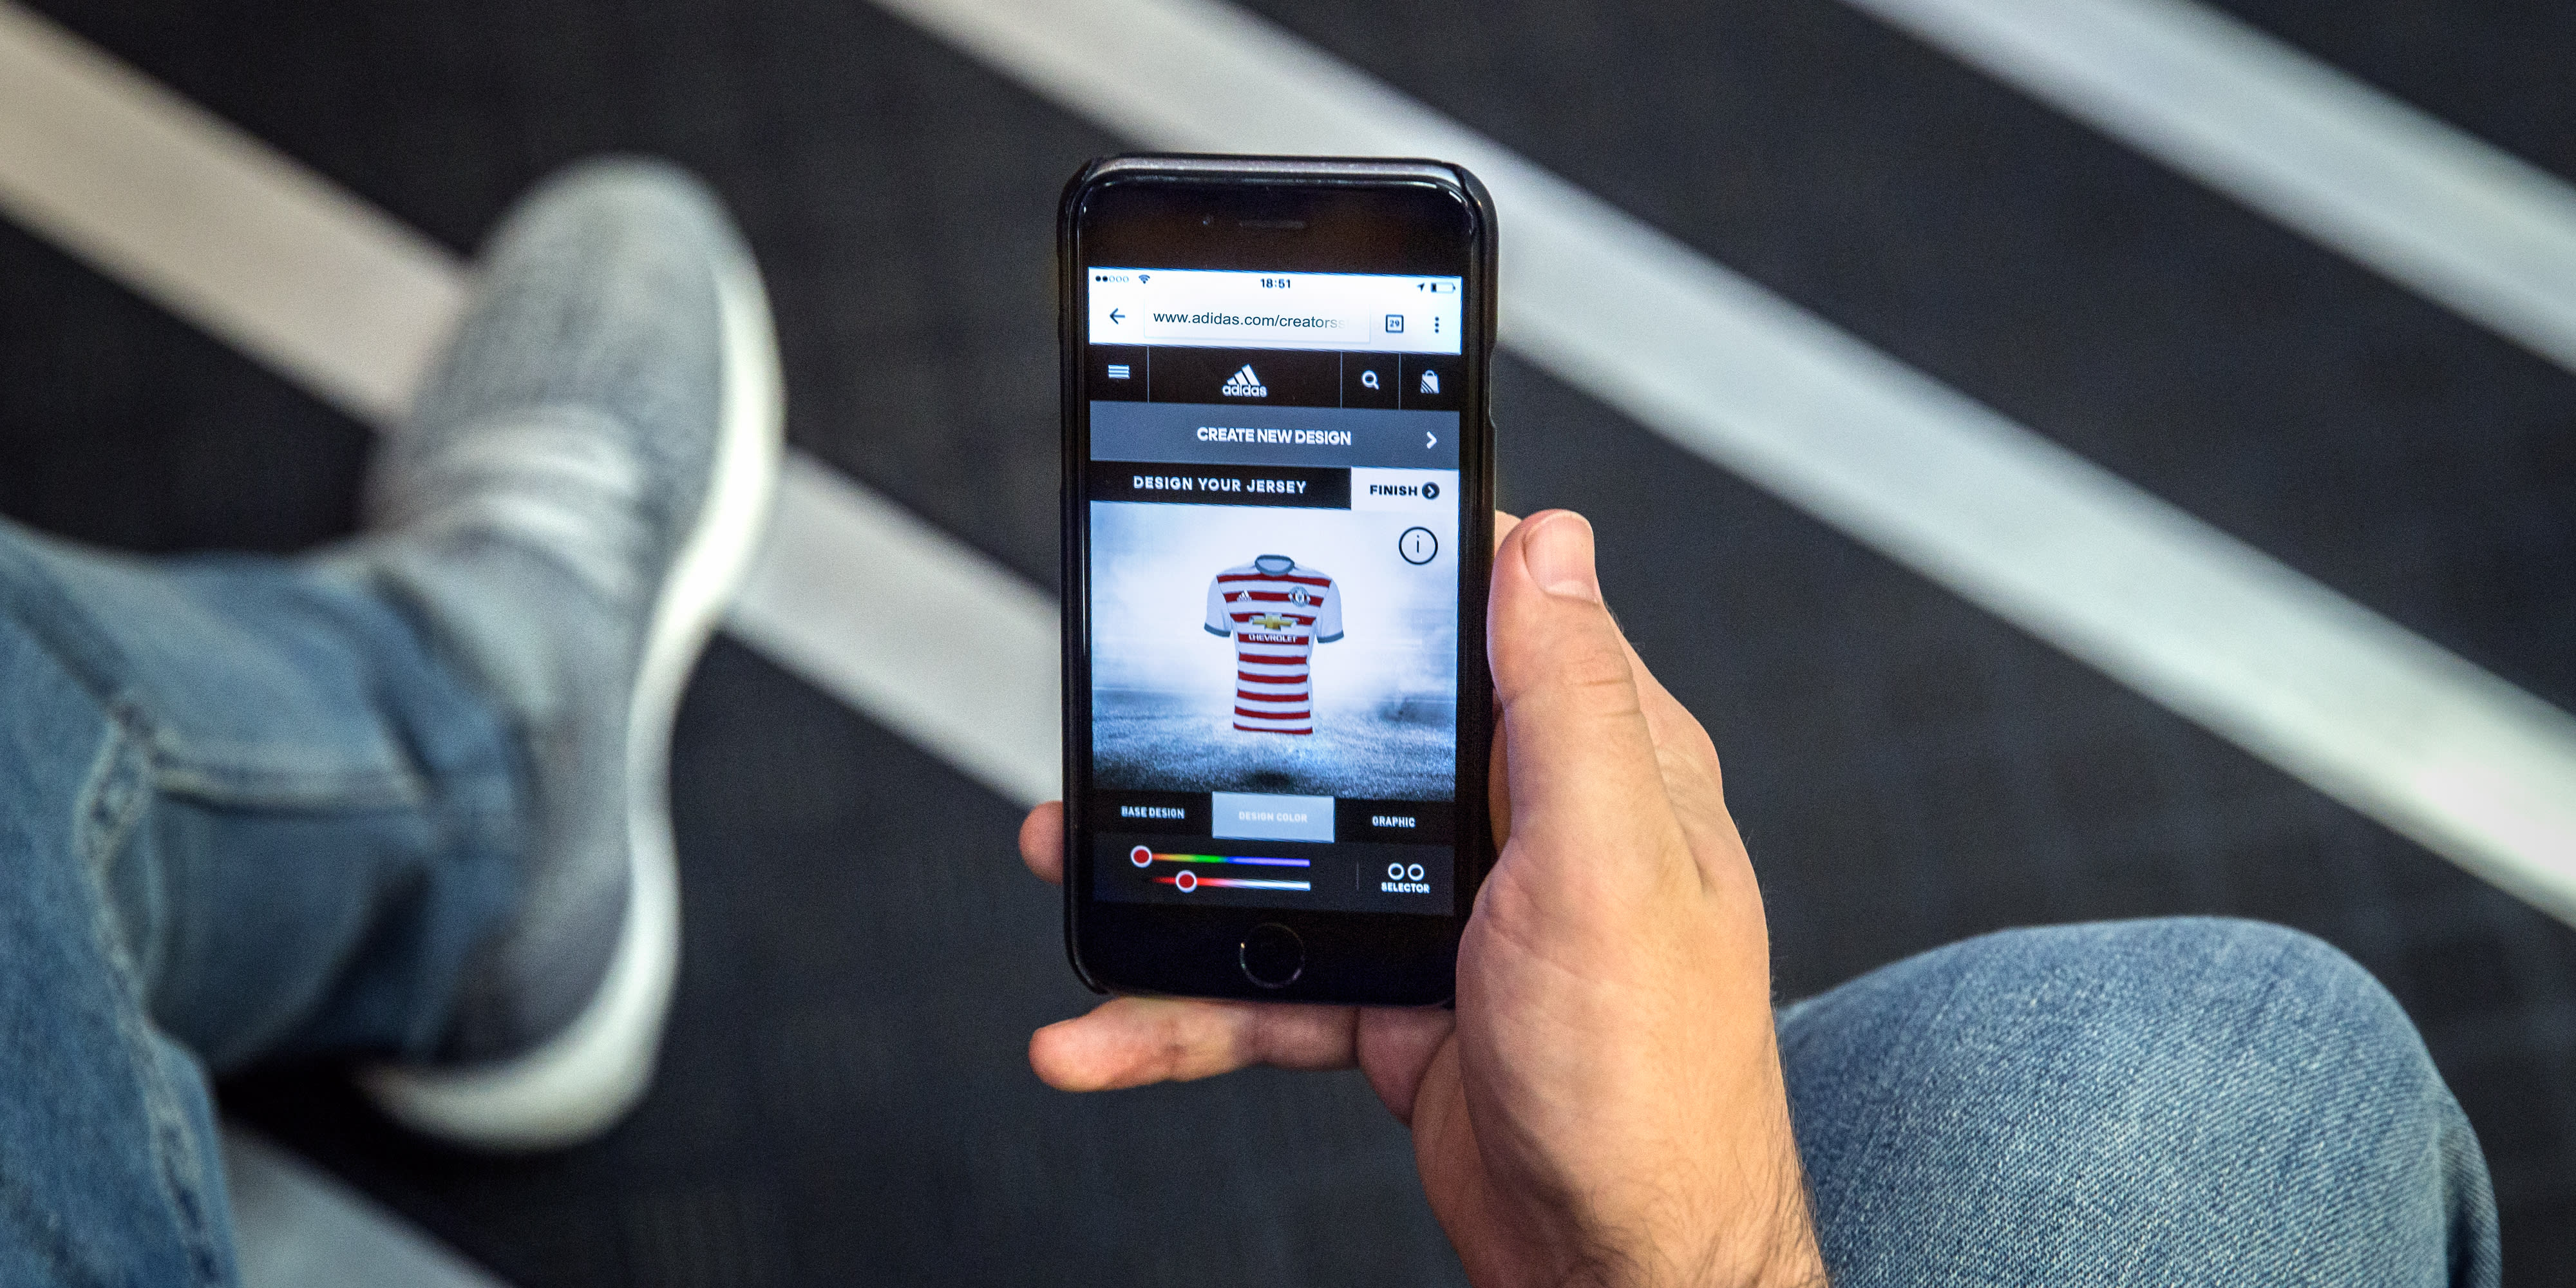 1c68d240377a Adidas Creator Studio lets you design kits for soccer teams